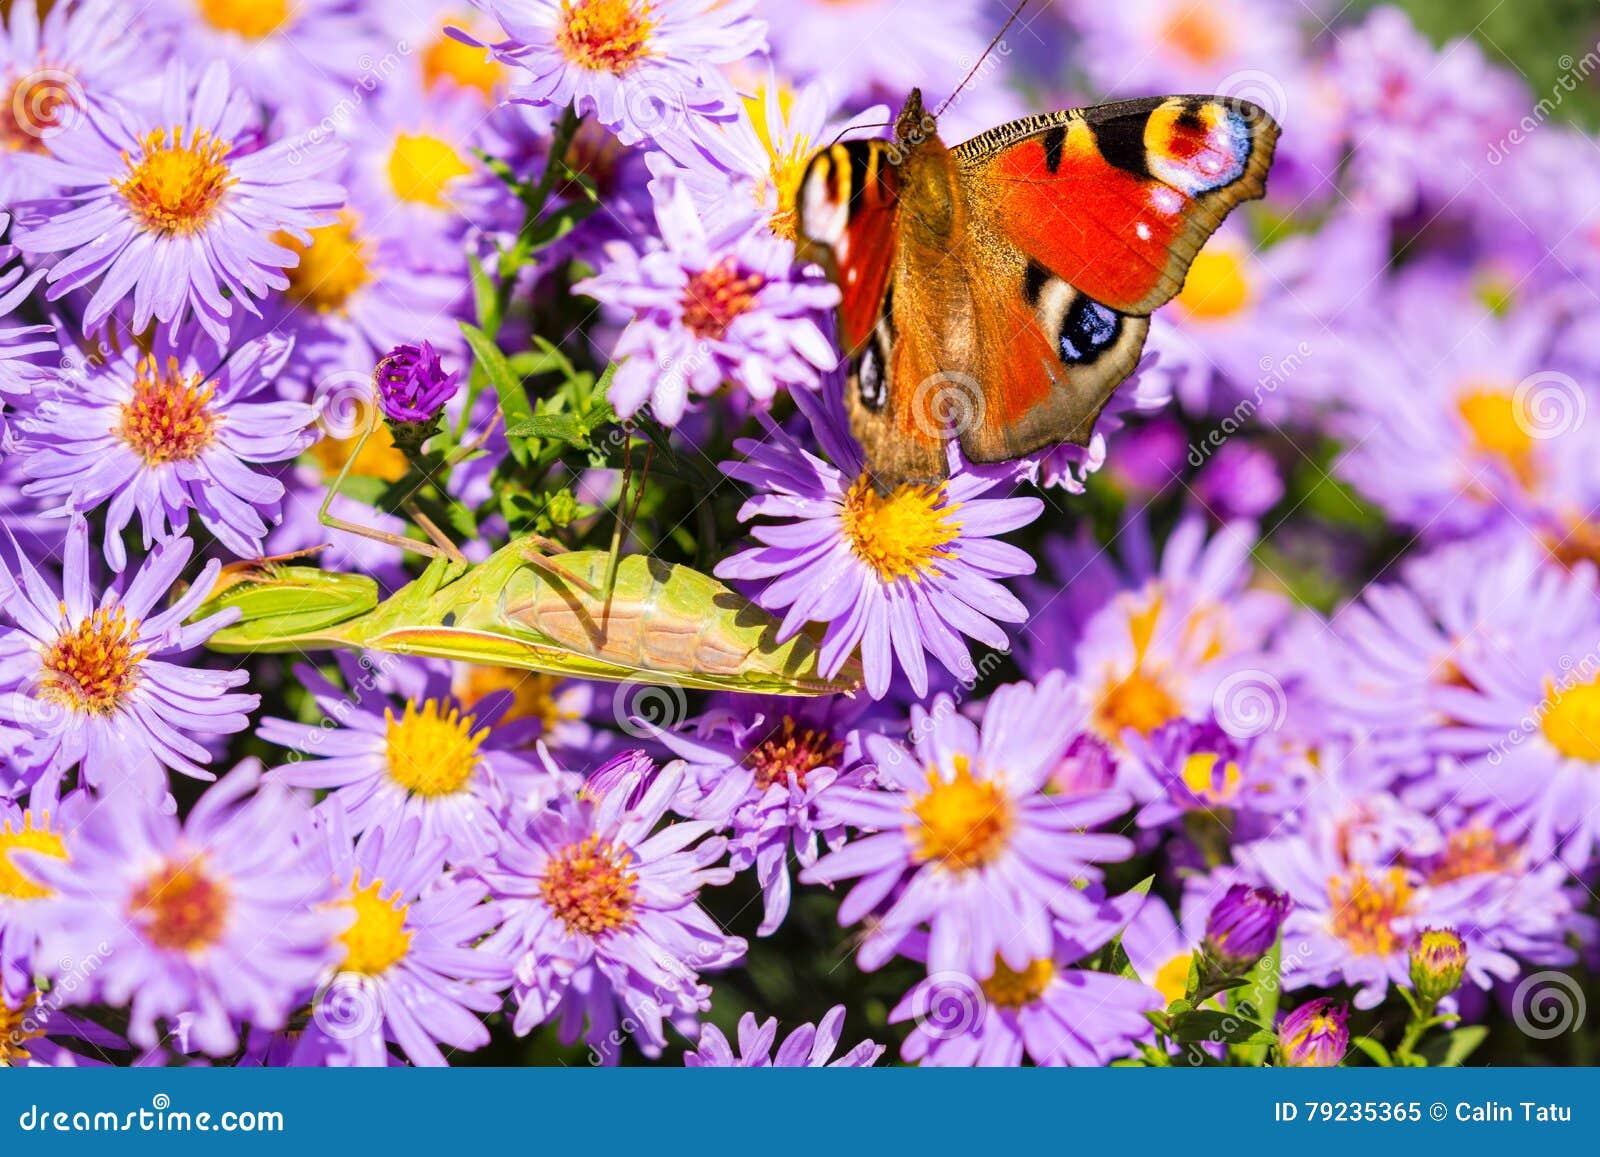 European peacock butterfly, inachis io, in purple wild flower meadow